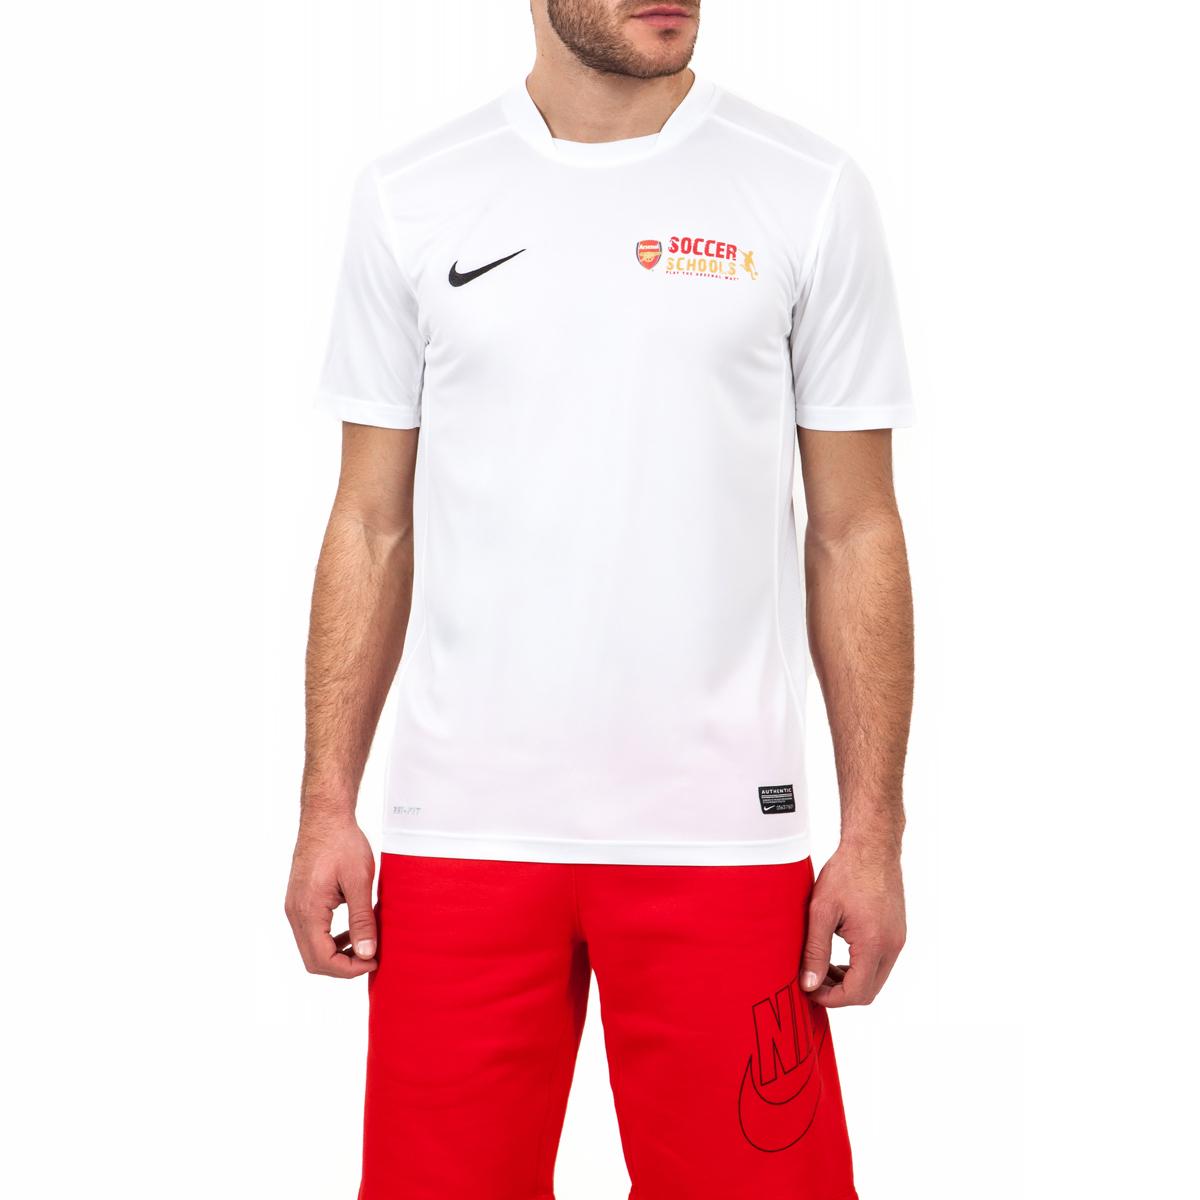 NIKE – Ανδρική μπλούζα Nike λευκή